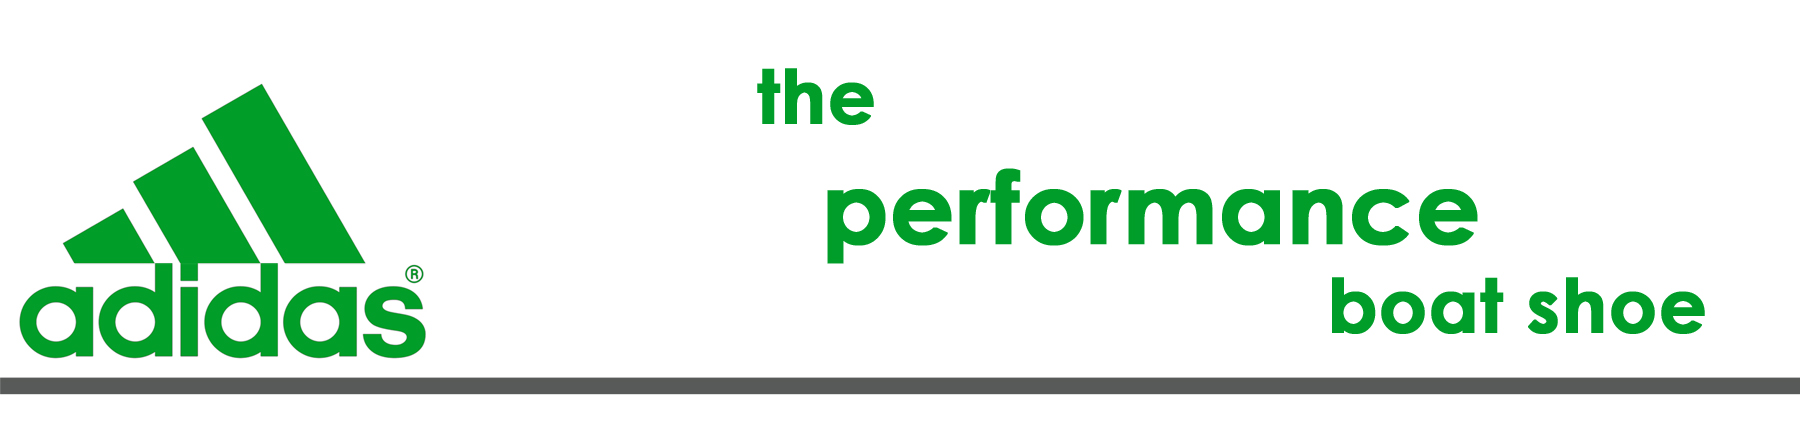 Adidas Performance Shoe Page